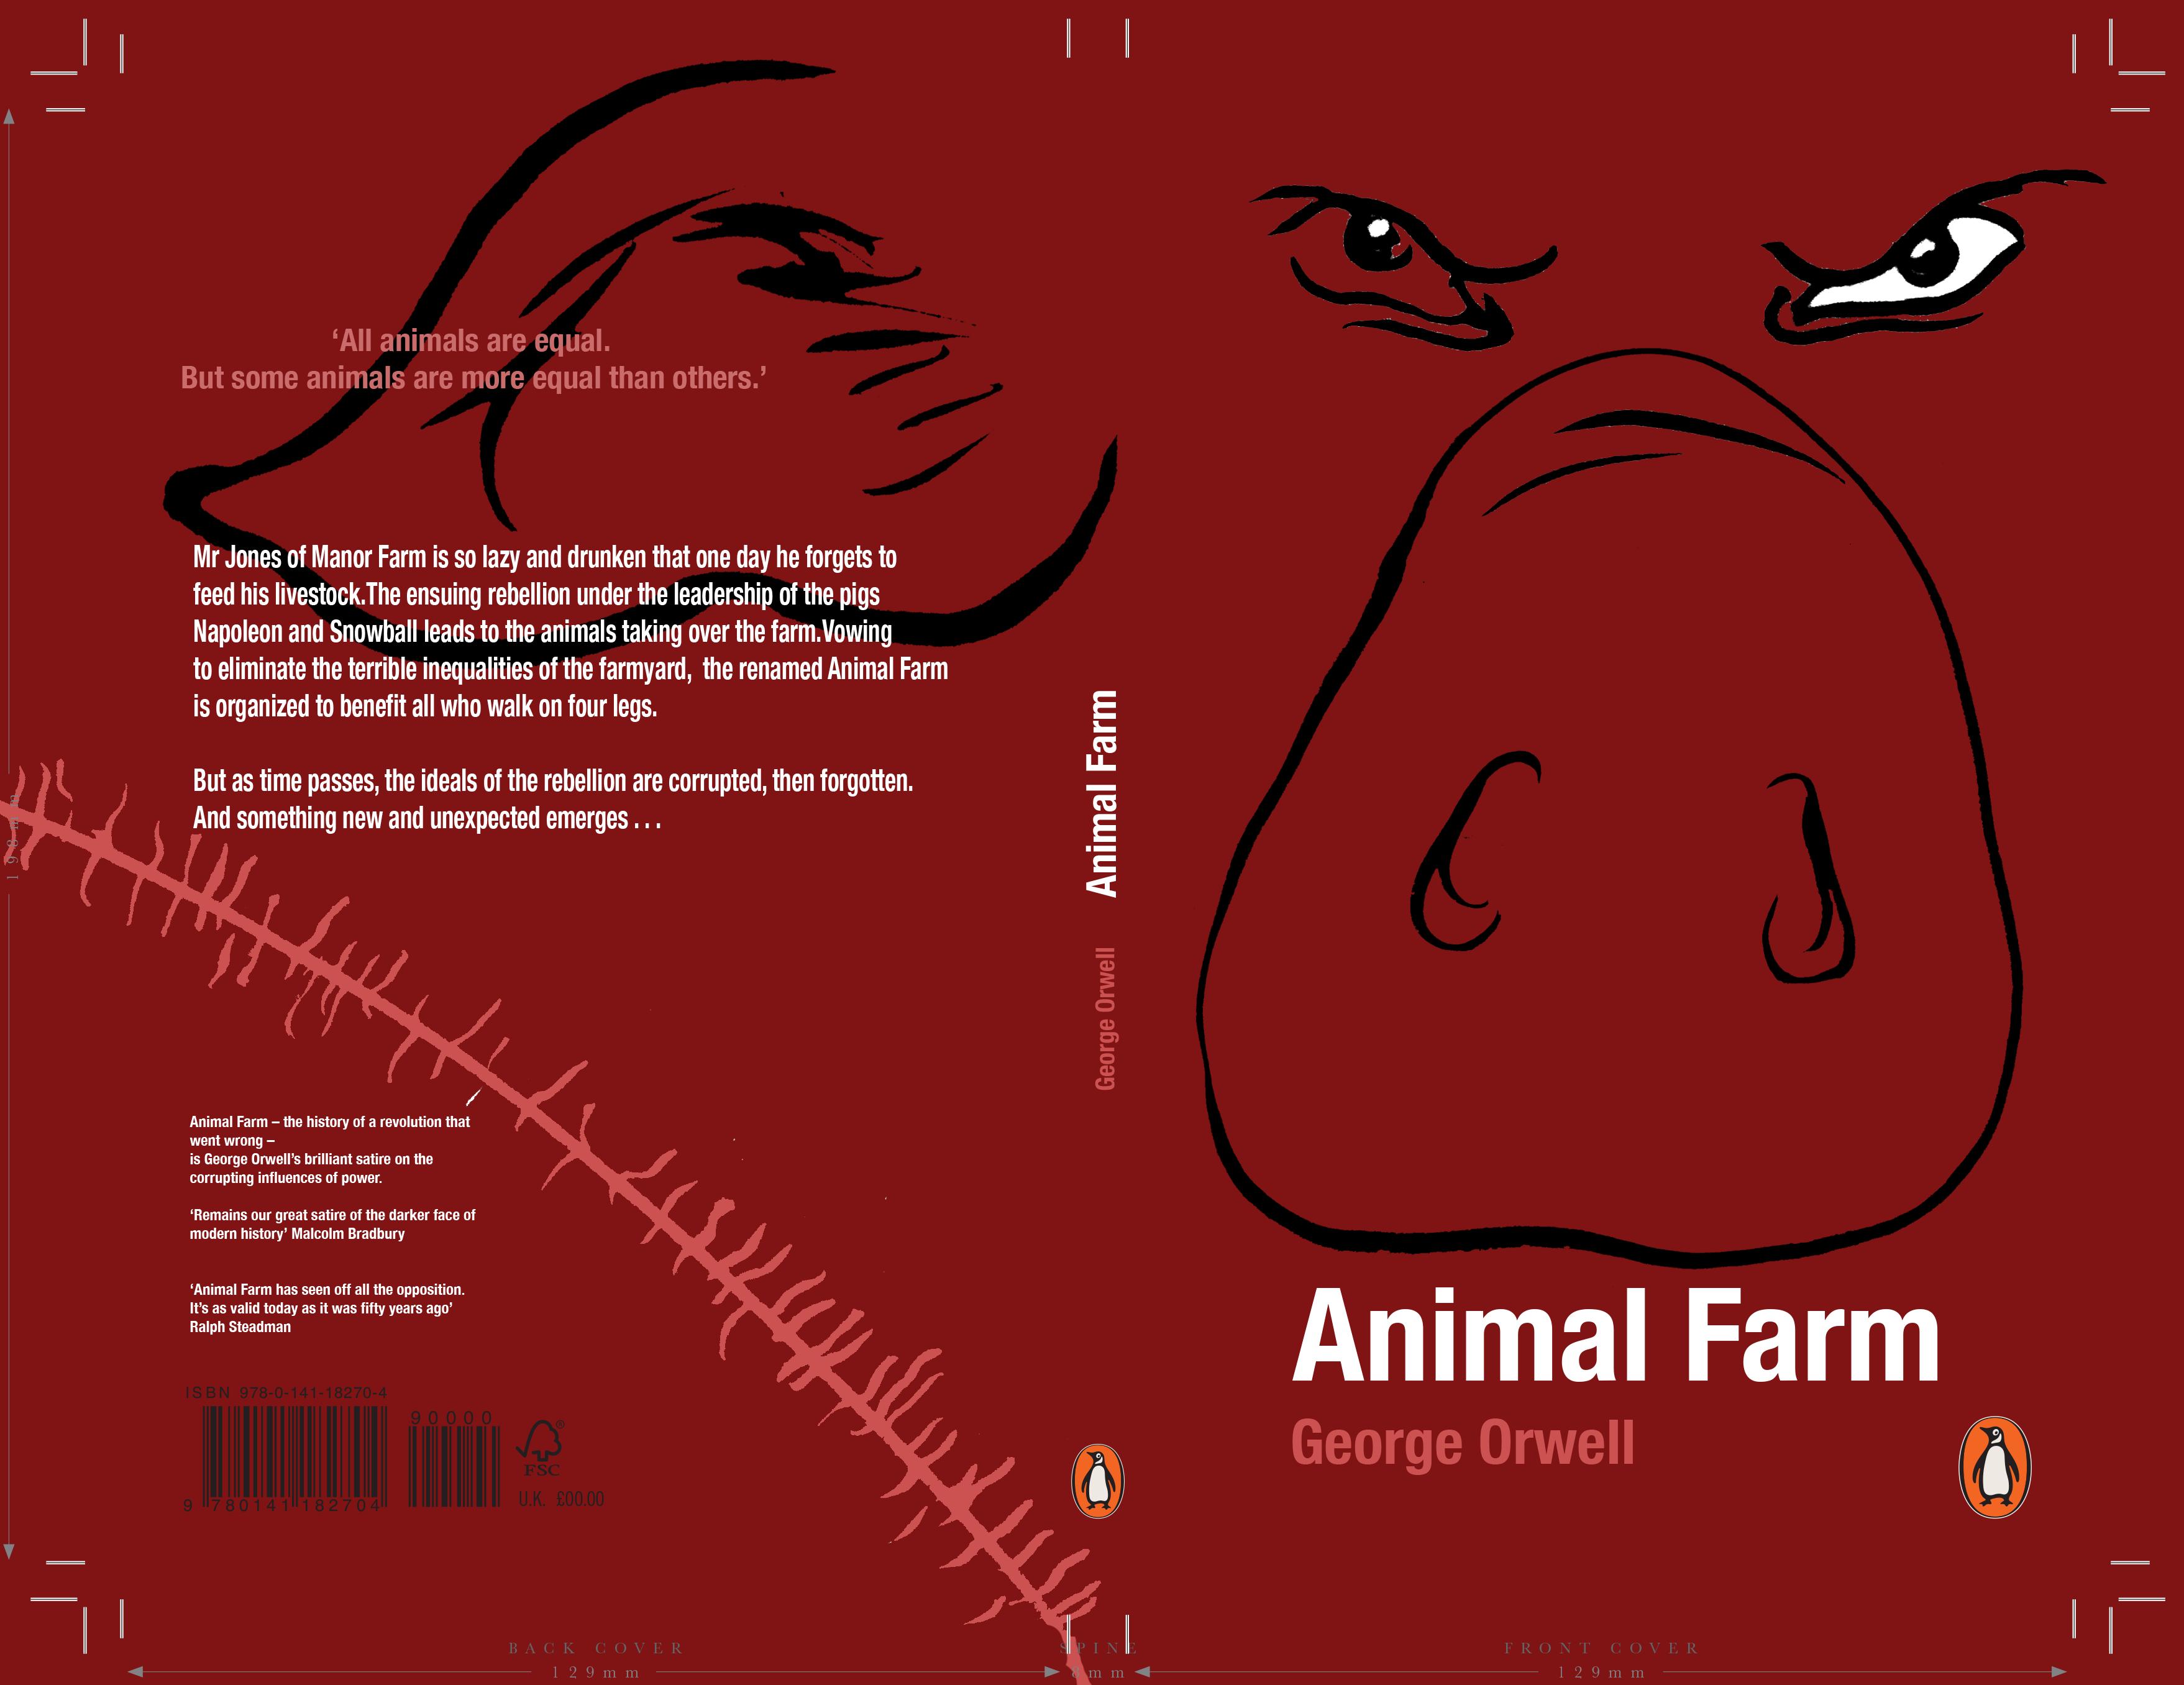 Penguin Book Cover Awards 2018 Adult Fiction Entries Animal Farm